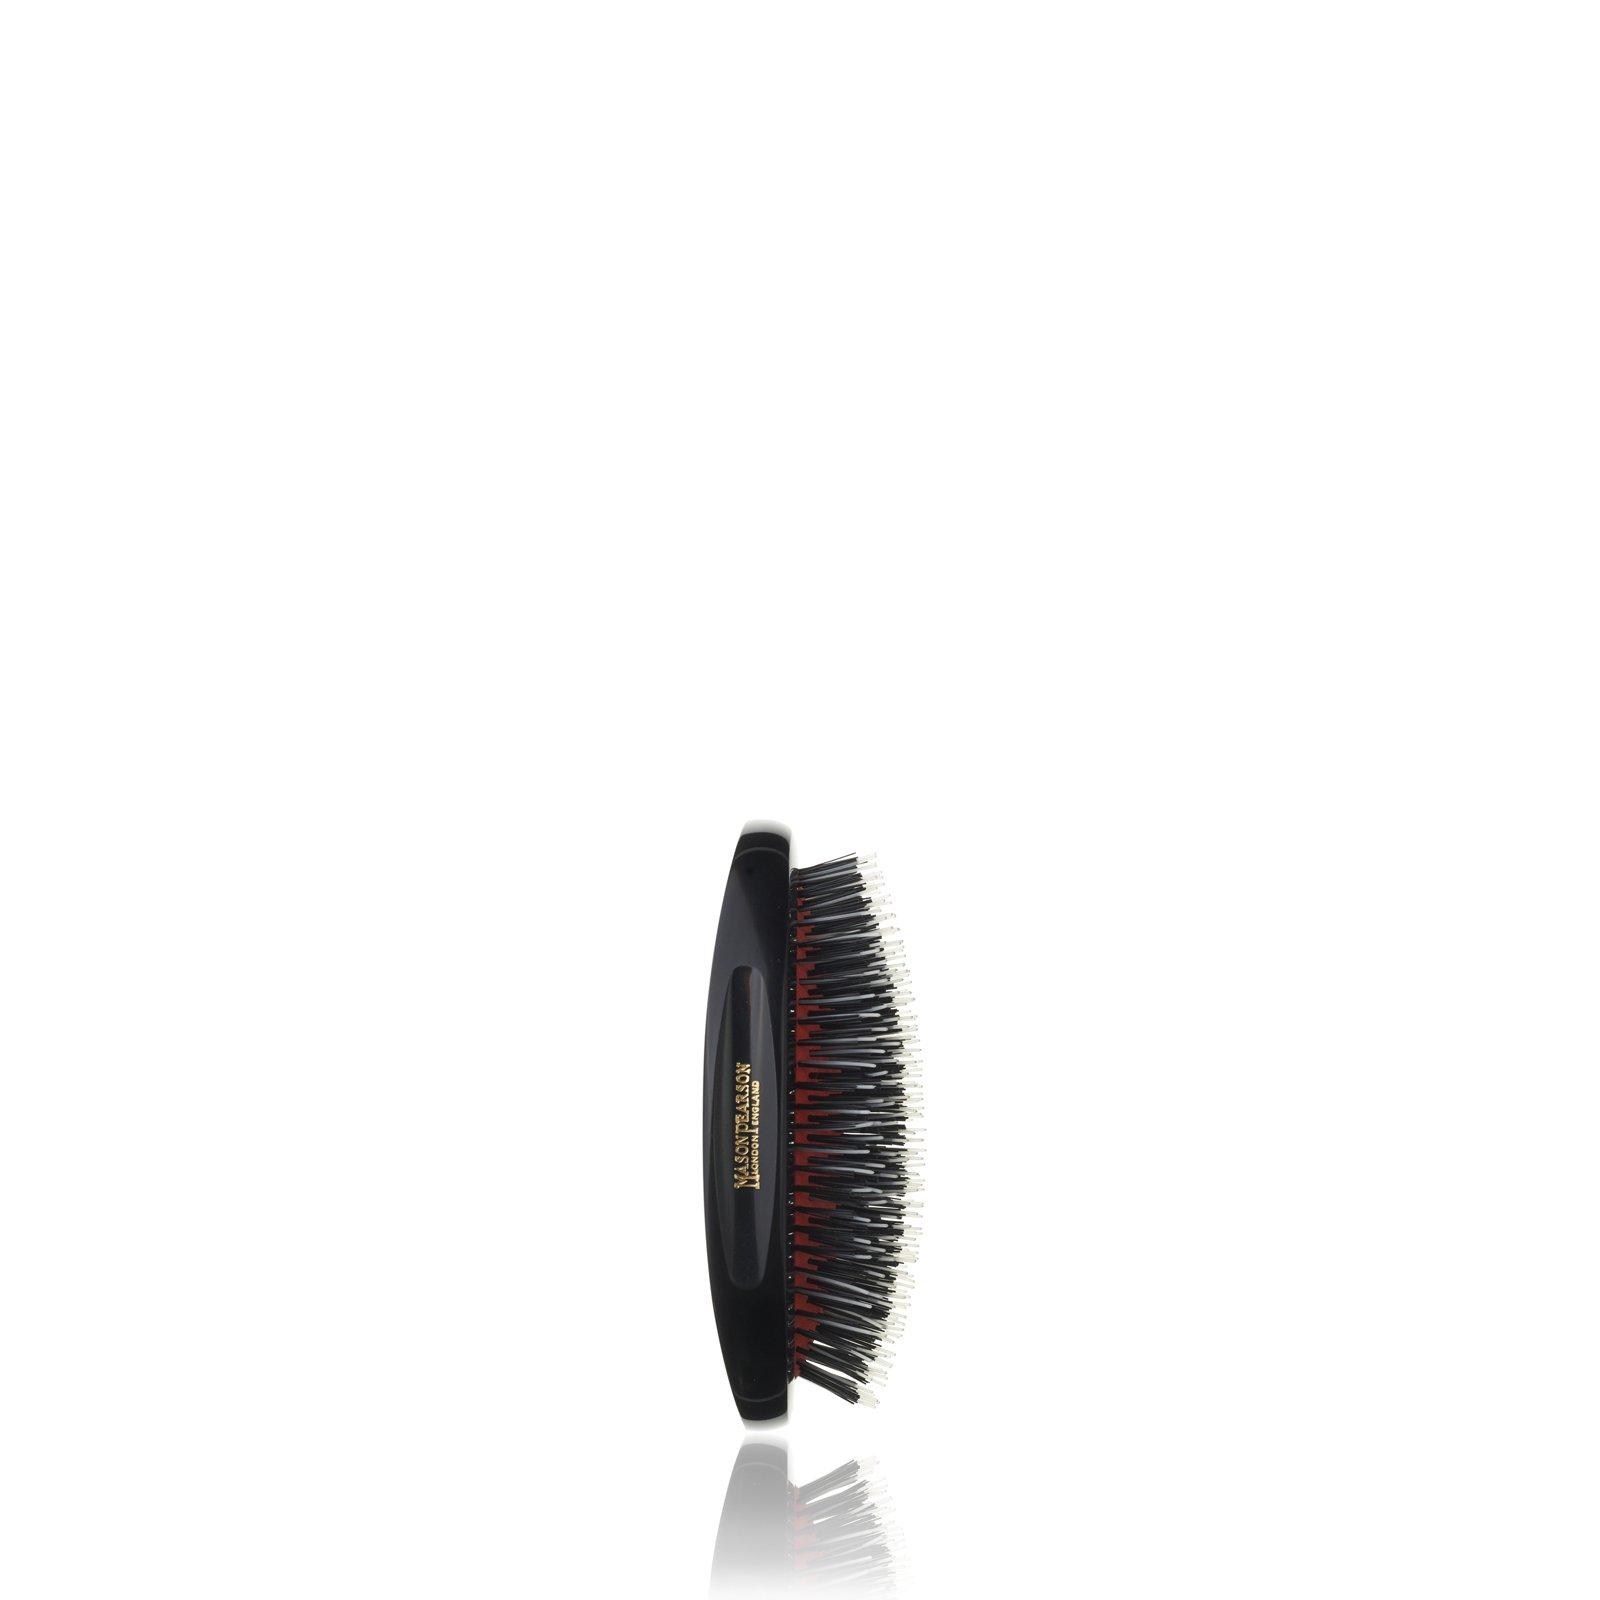 BN2M Junior Military Hairbrush from Mason Pearson (Dark ruby)